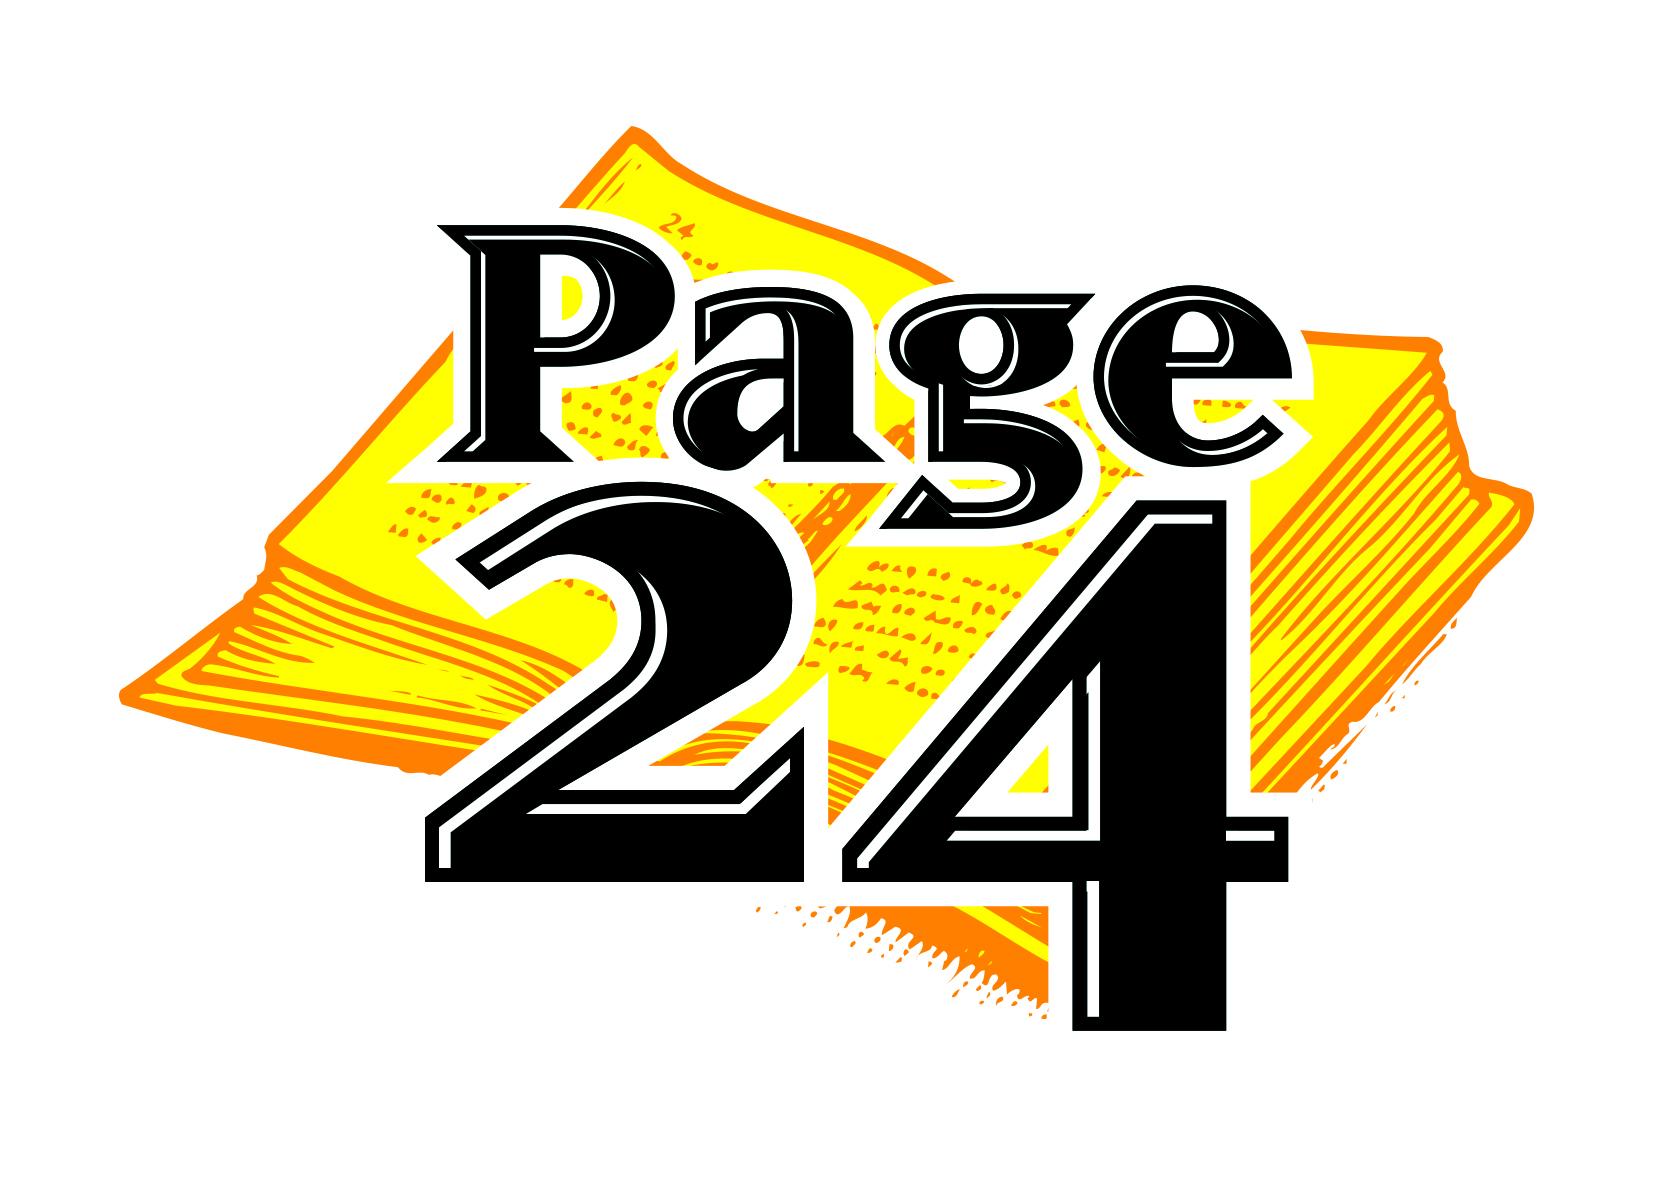 Logo Page 24